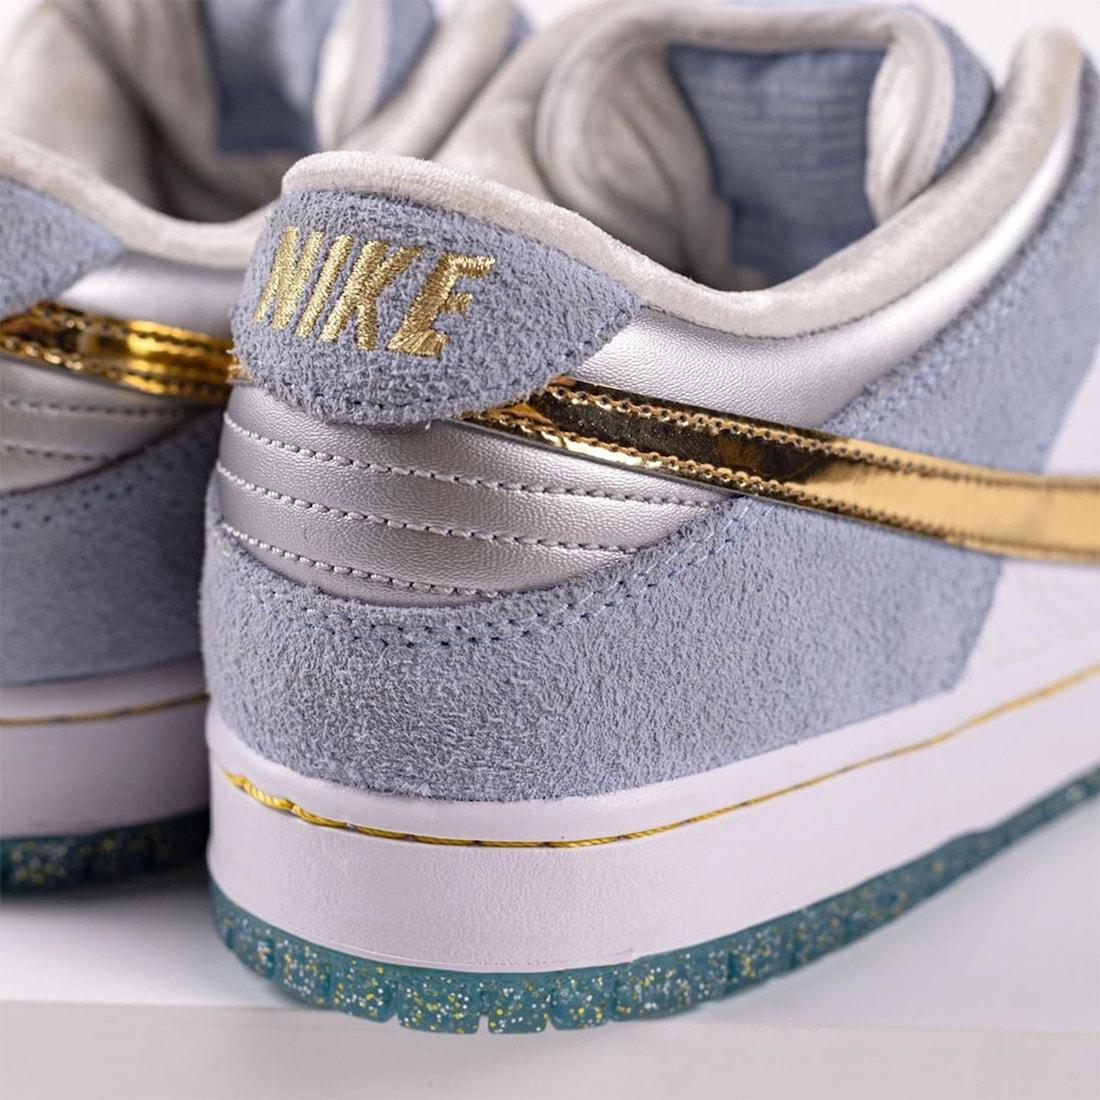 Sean-Cliver-Nike-SB-Dunk-Low-DC9936-100-pair-heel-right